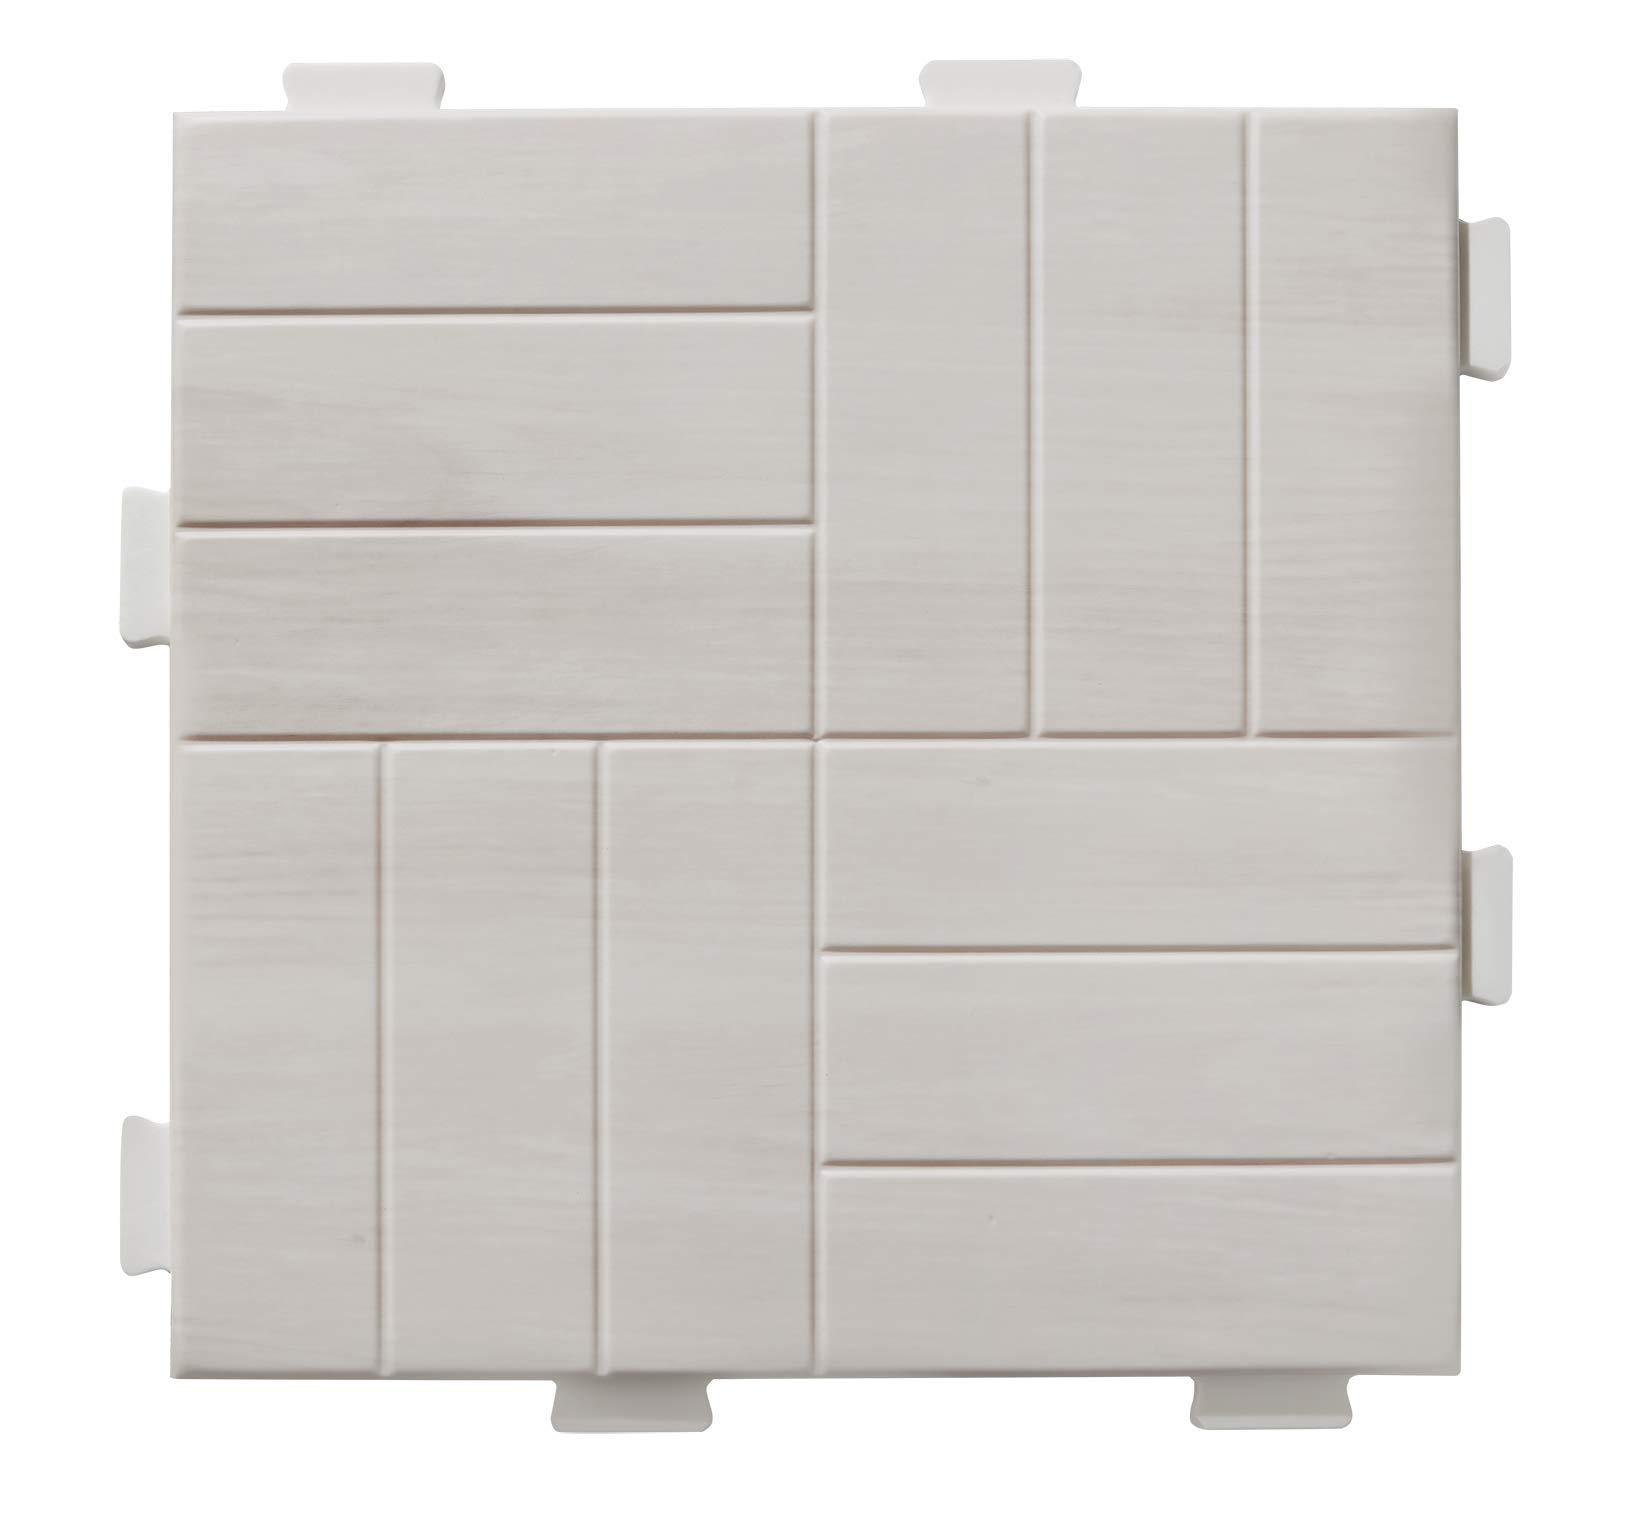 [Alzip Mat] TPU Puzzle mat (Non-Toxic, Non-Slip, Waterproof) (Maple Wood)